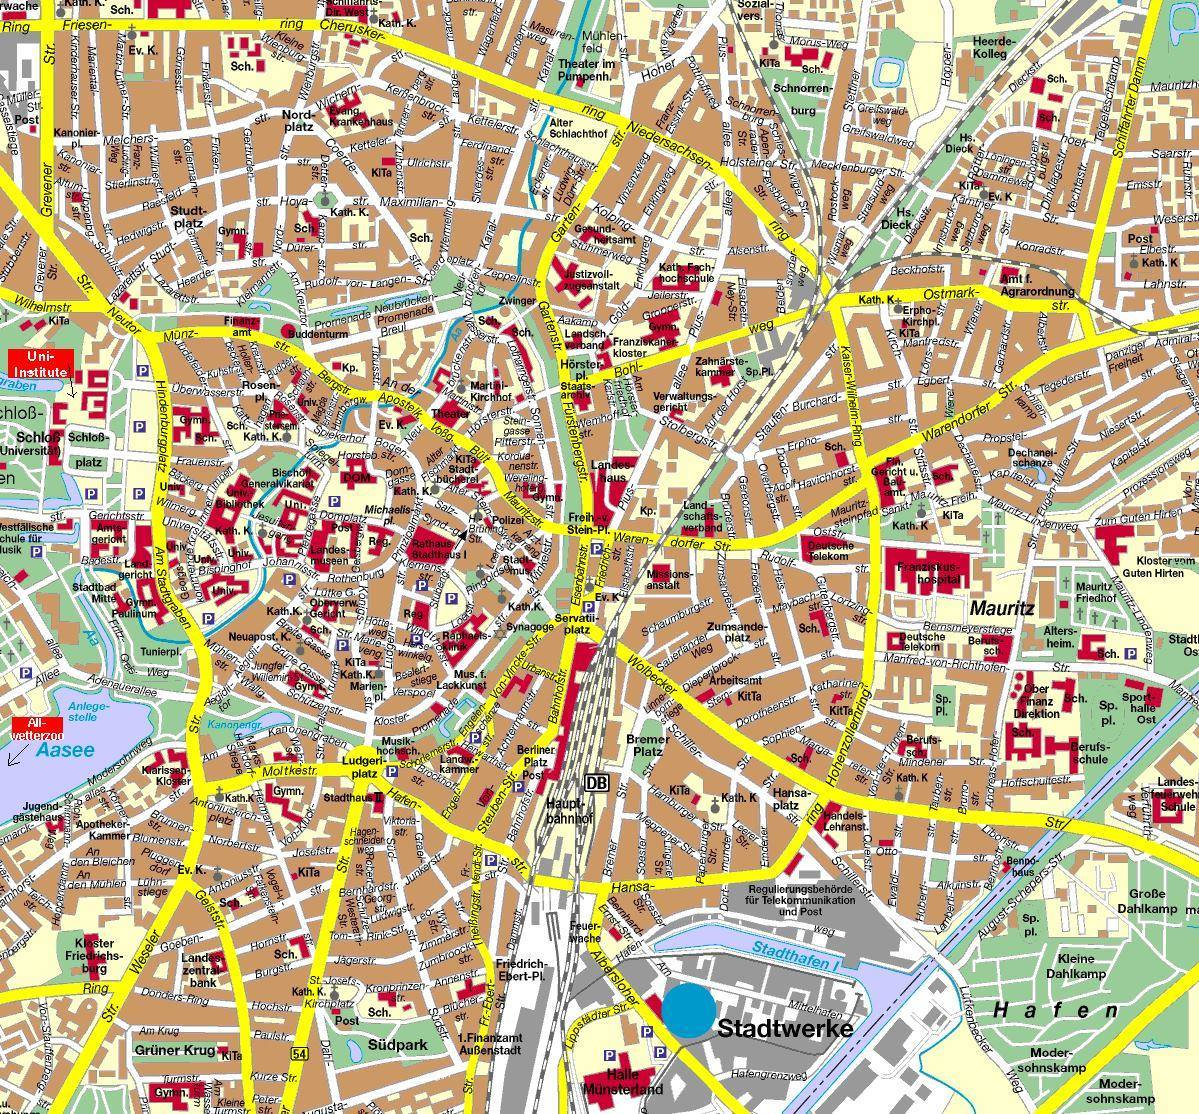 hanover mapa Mapa Hanover   Plano de Hanover hanover mapa